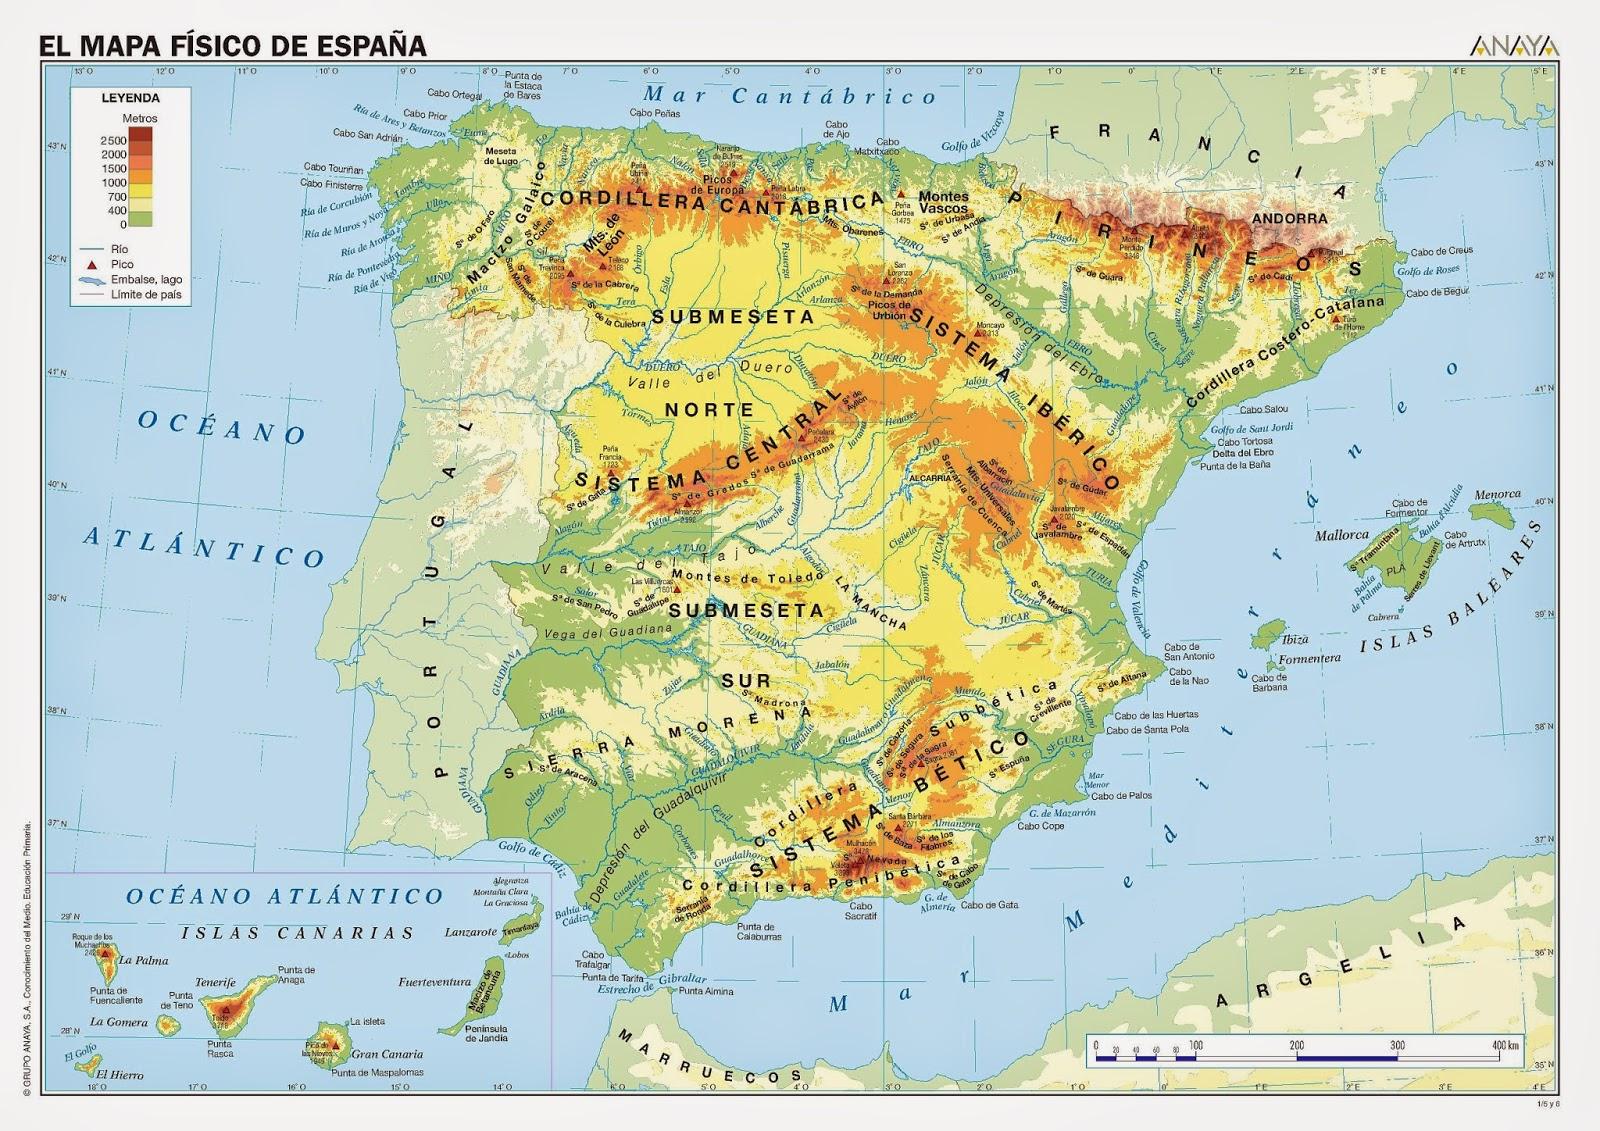 MAPAS DO MUNDO EN GALEGO MAPA FSICO DE ESPAA